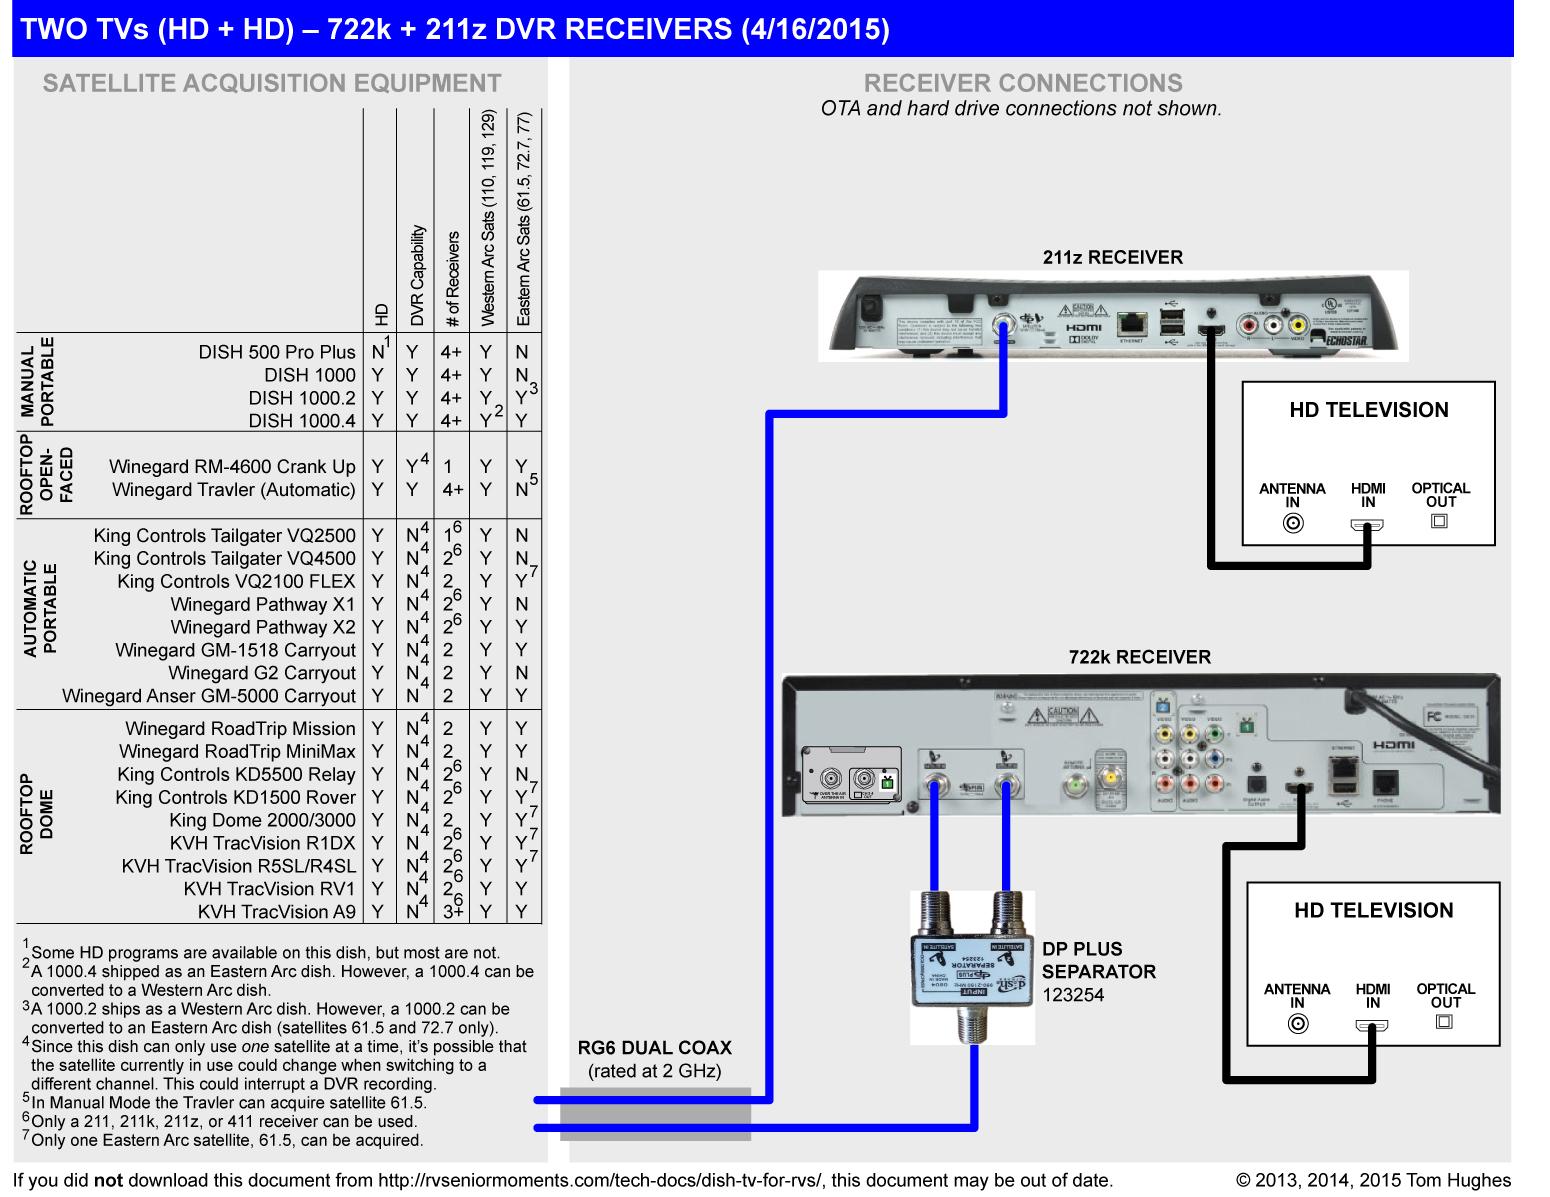 hight resolution of vip 722 wiring diagram wiring diagram technicvip 722 wiring diagram dish tv for rvs rvseniormomentsone 622